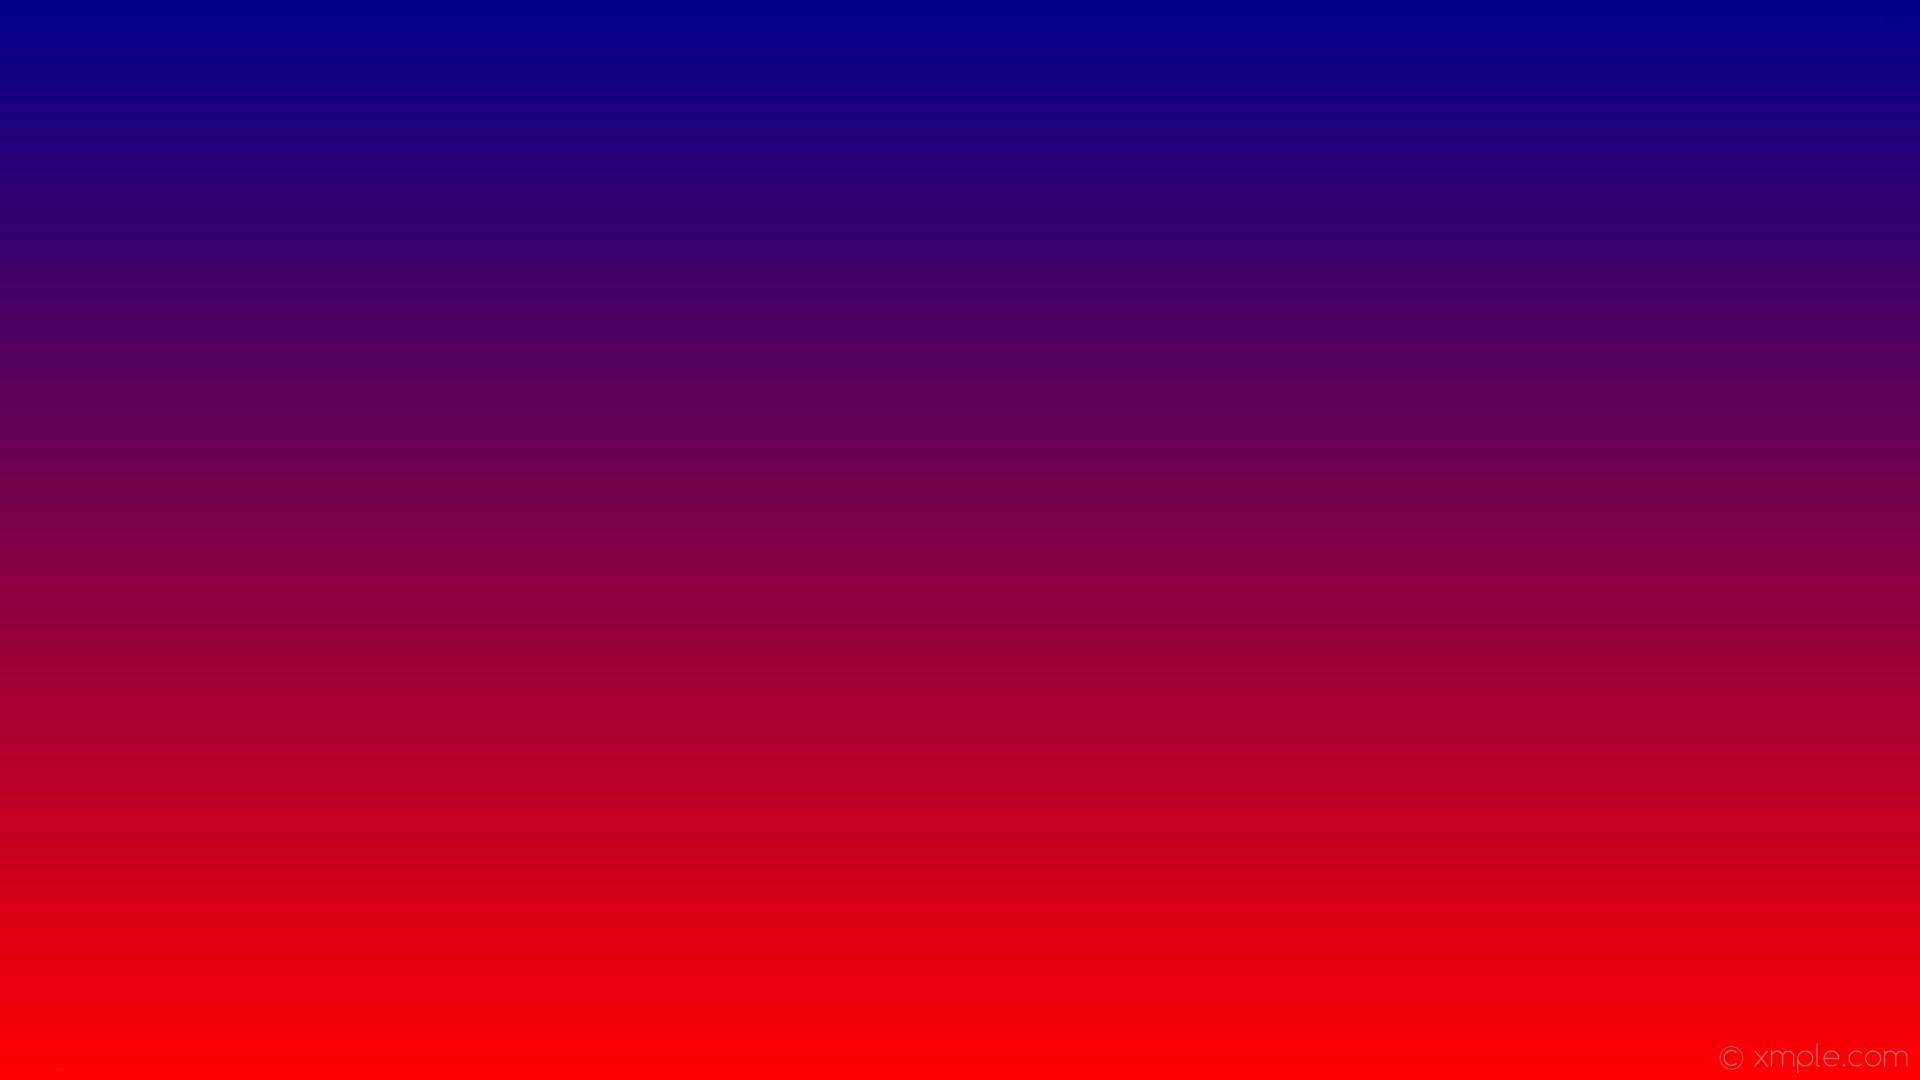 wallpaper blue red gradient linear dark blue #00008b #ff0000 90°